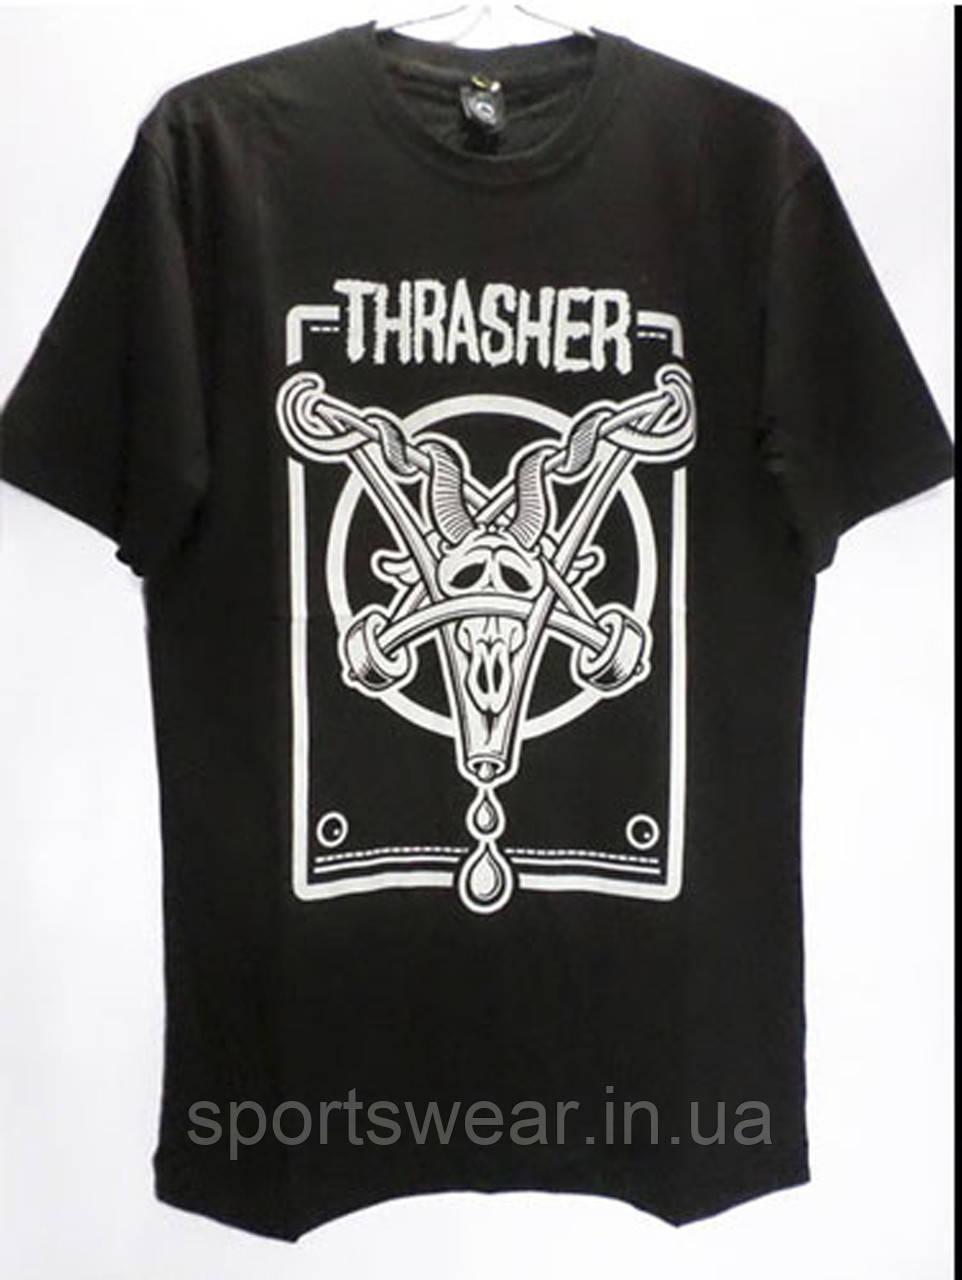 "Футболка мужская Thrasher logo | Трешер Футболка """" В стиле Thrasher """""